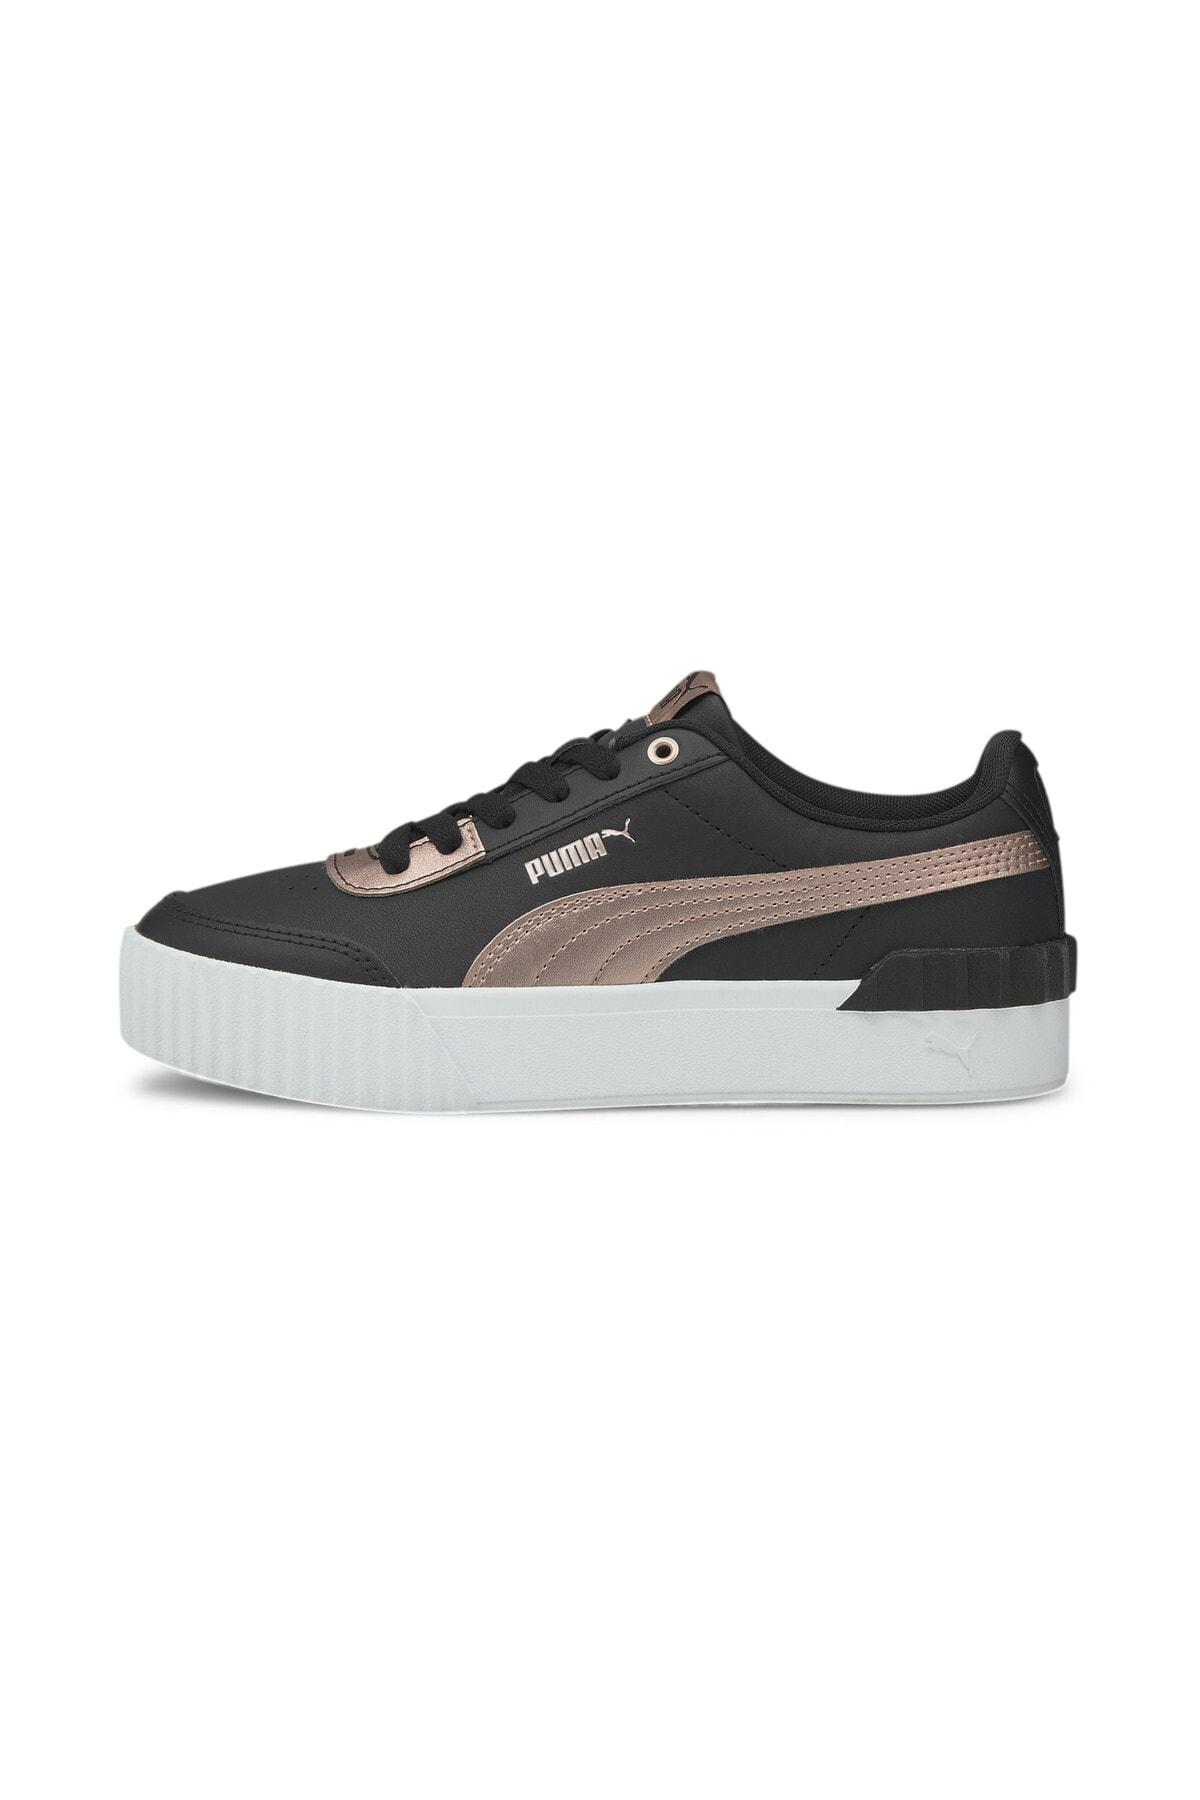 Puma Kadın Sneaker - CARINA LIFT METALLIC - 37599502 0